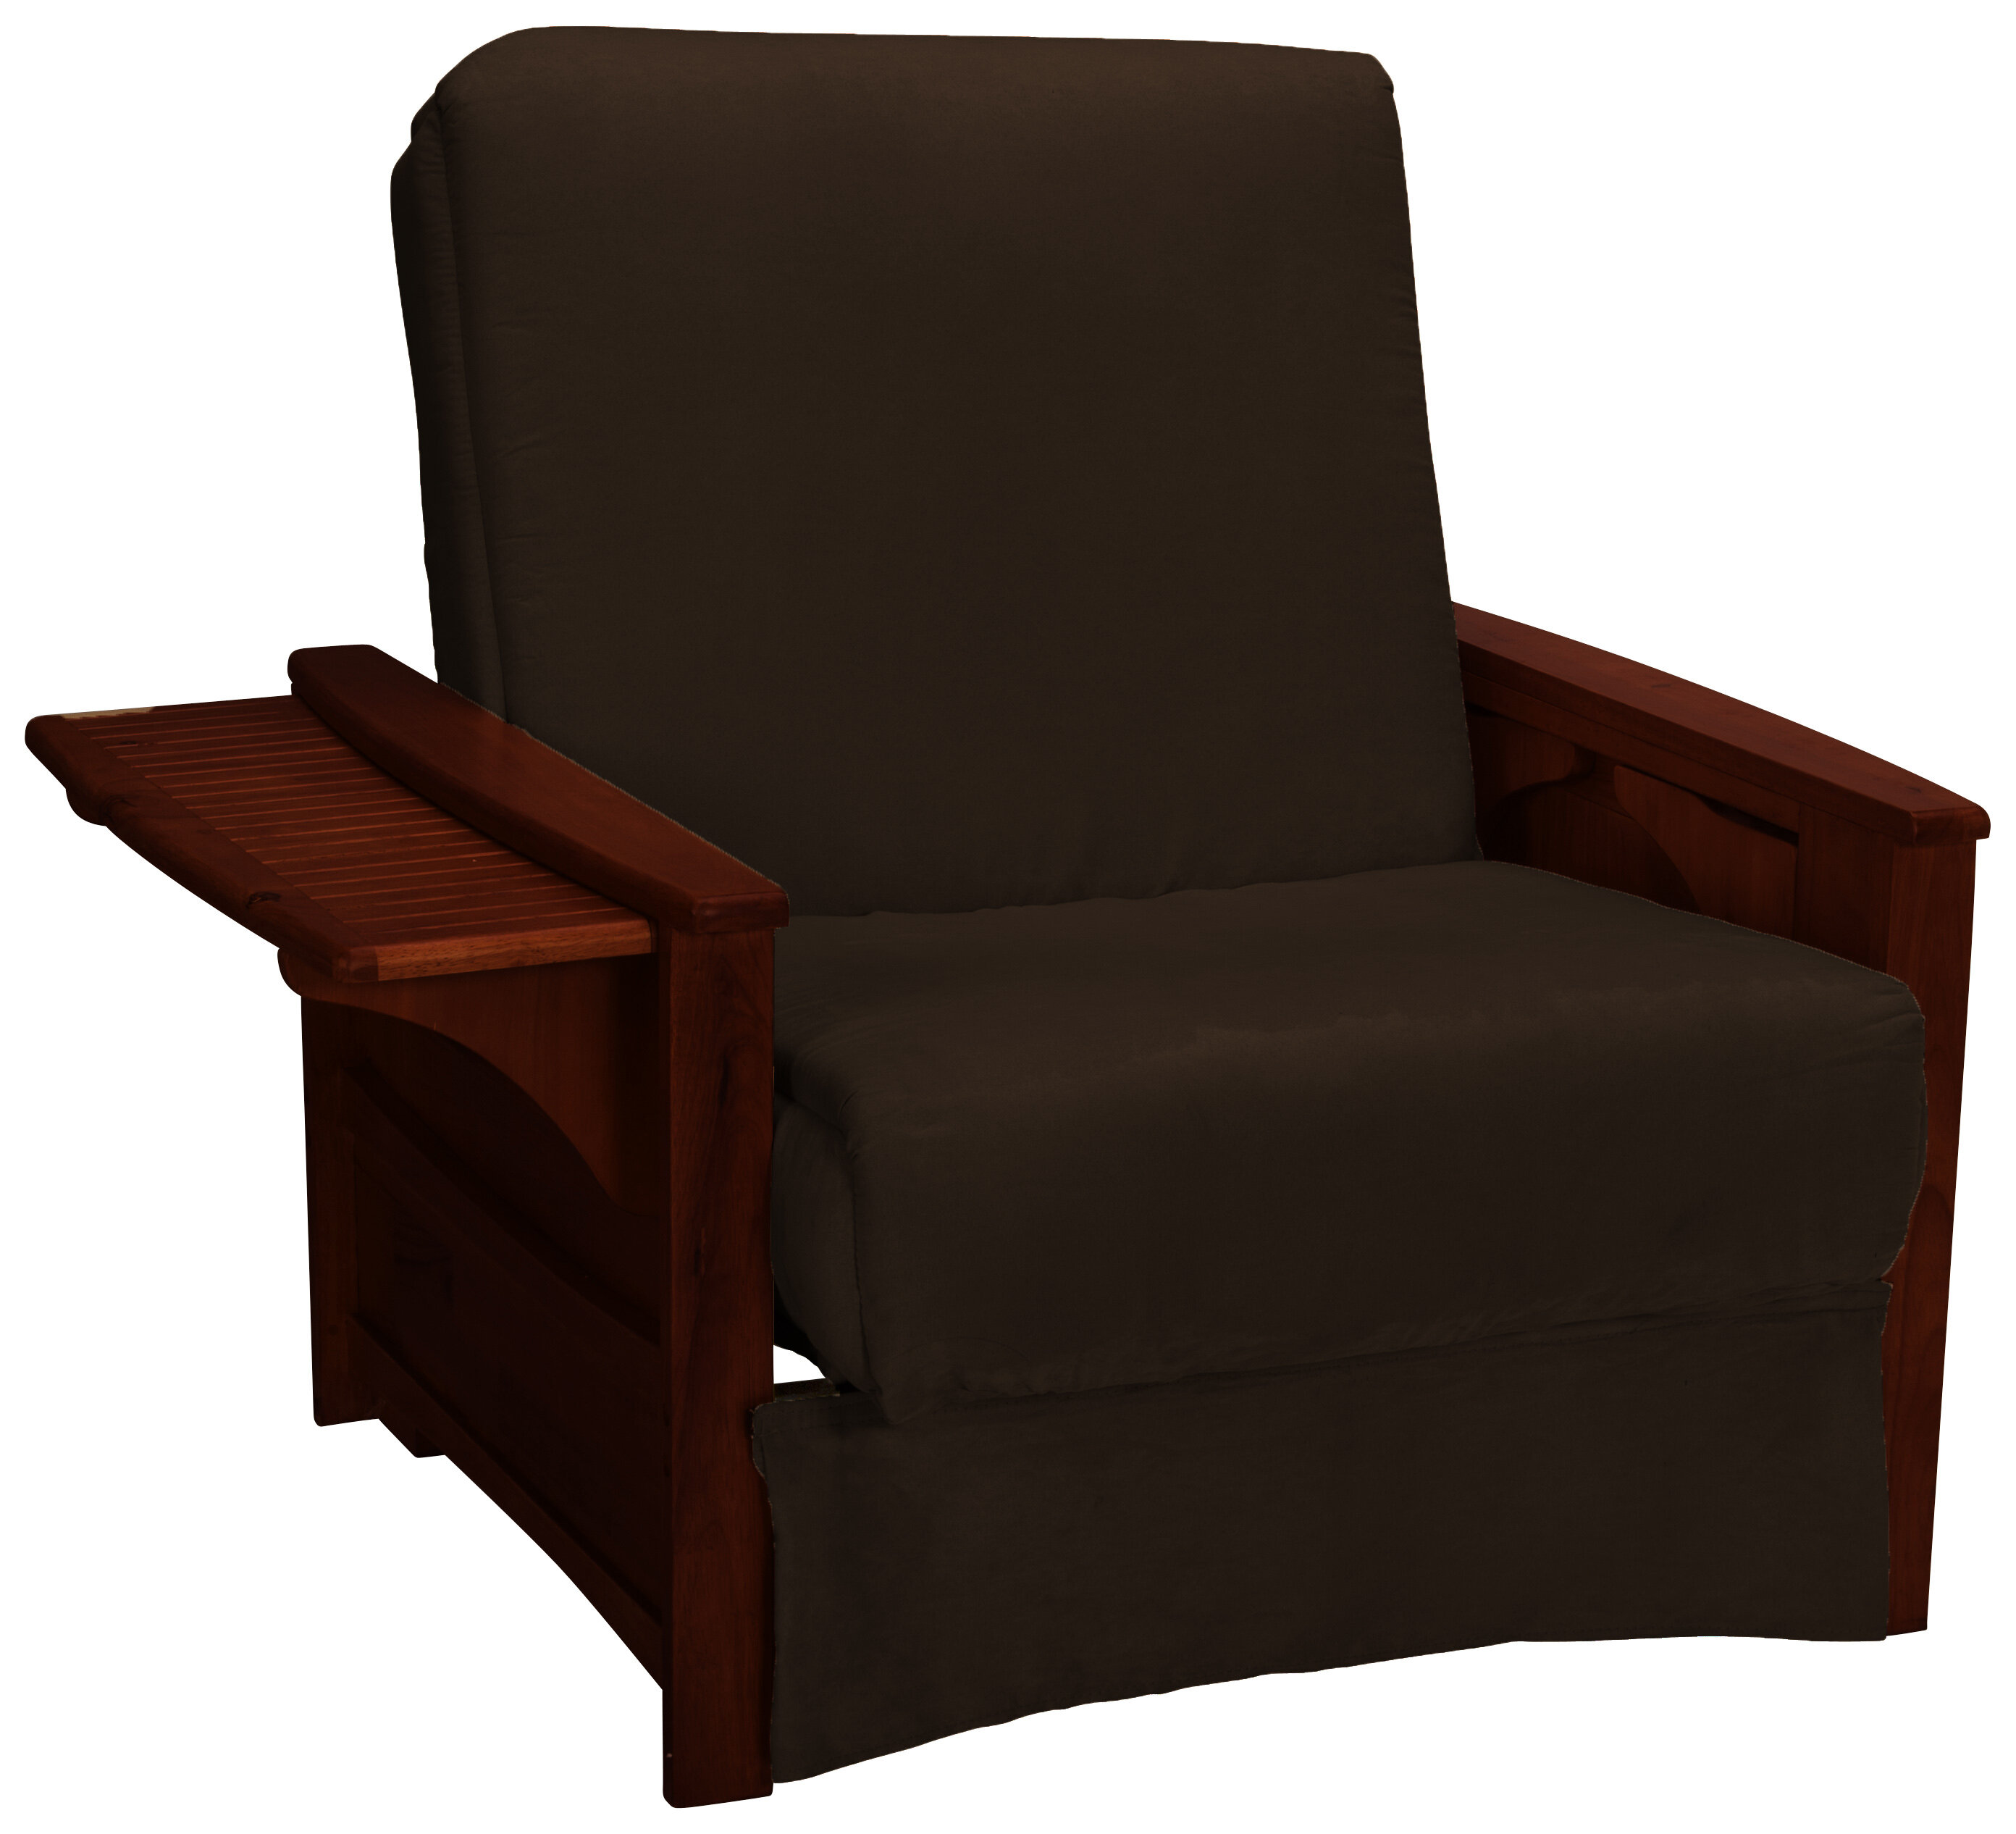 Beau Epic Furnishings LLC Valet Perfect Sit And Sleep Futon Chair   Wayfair